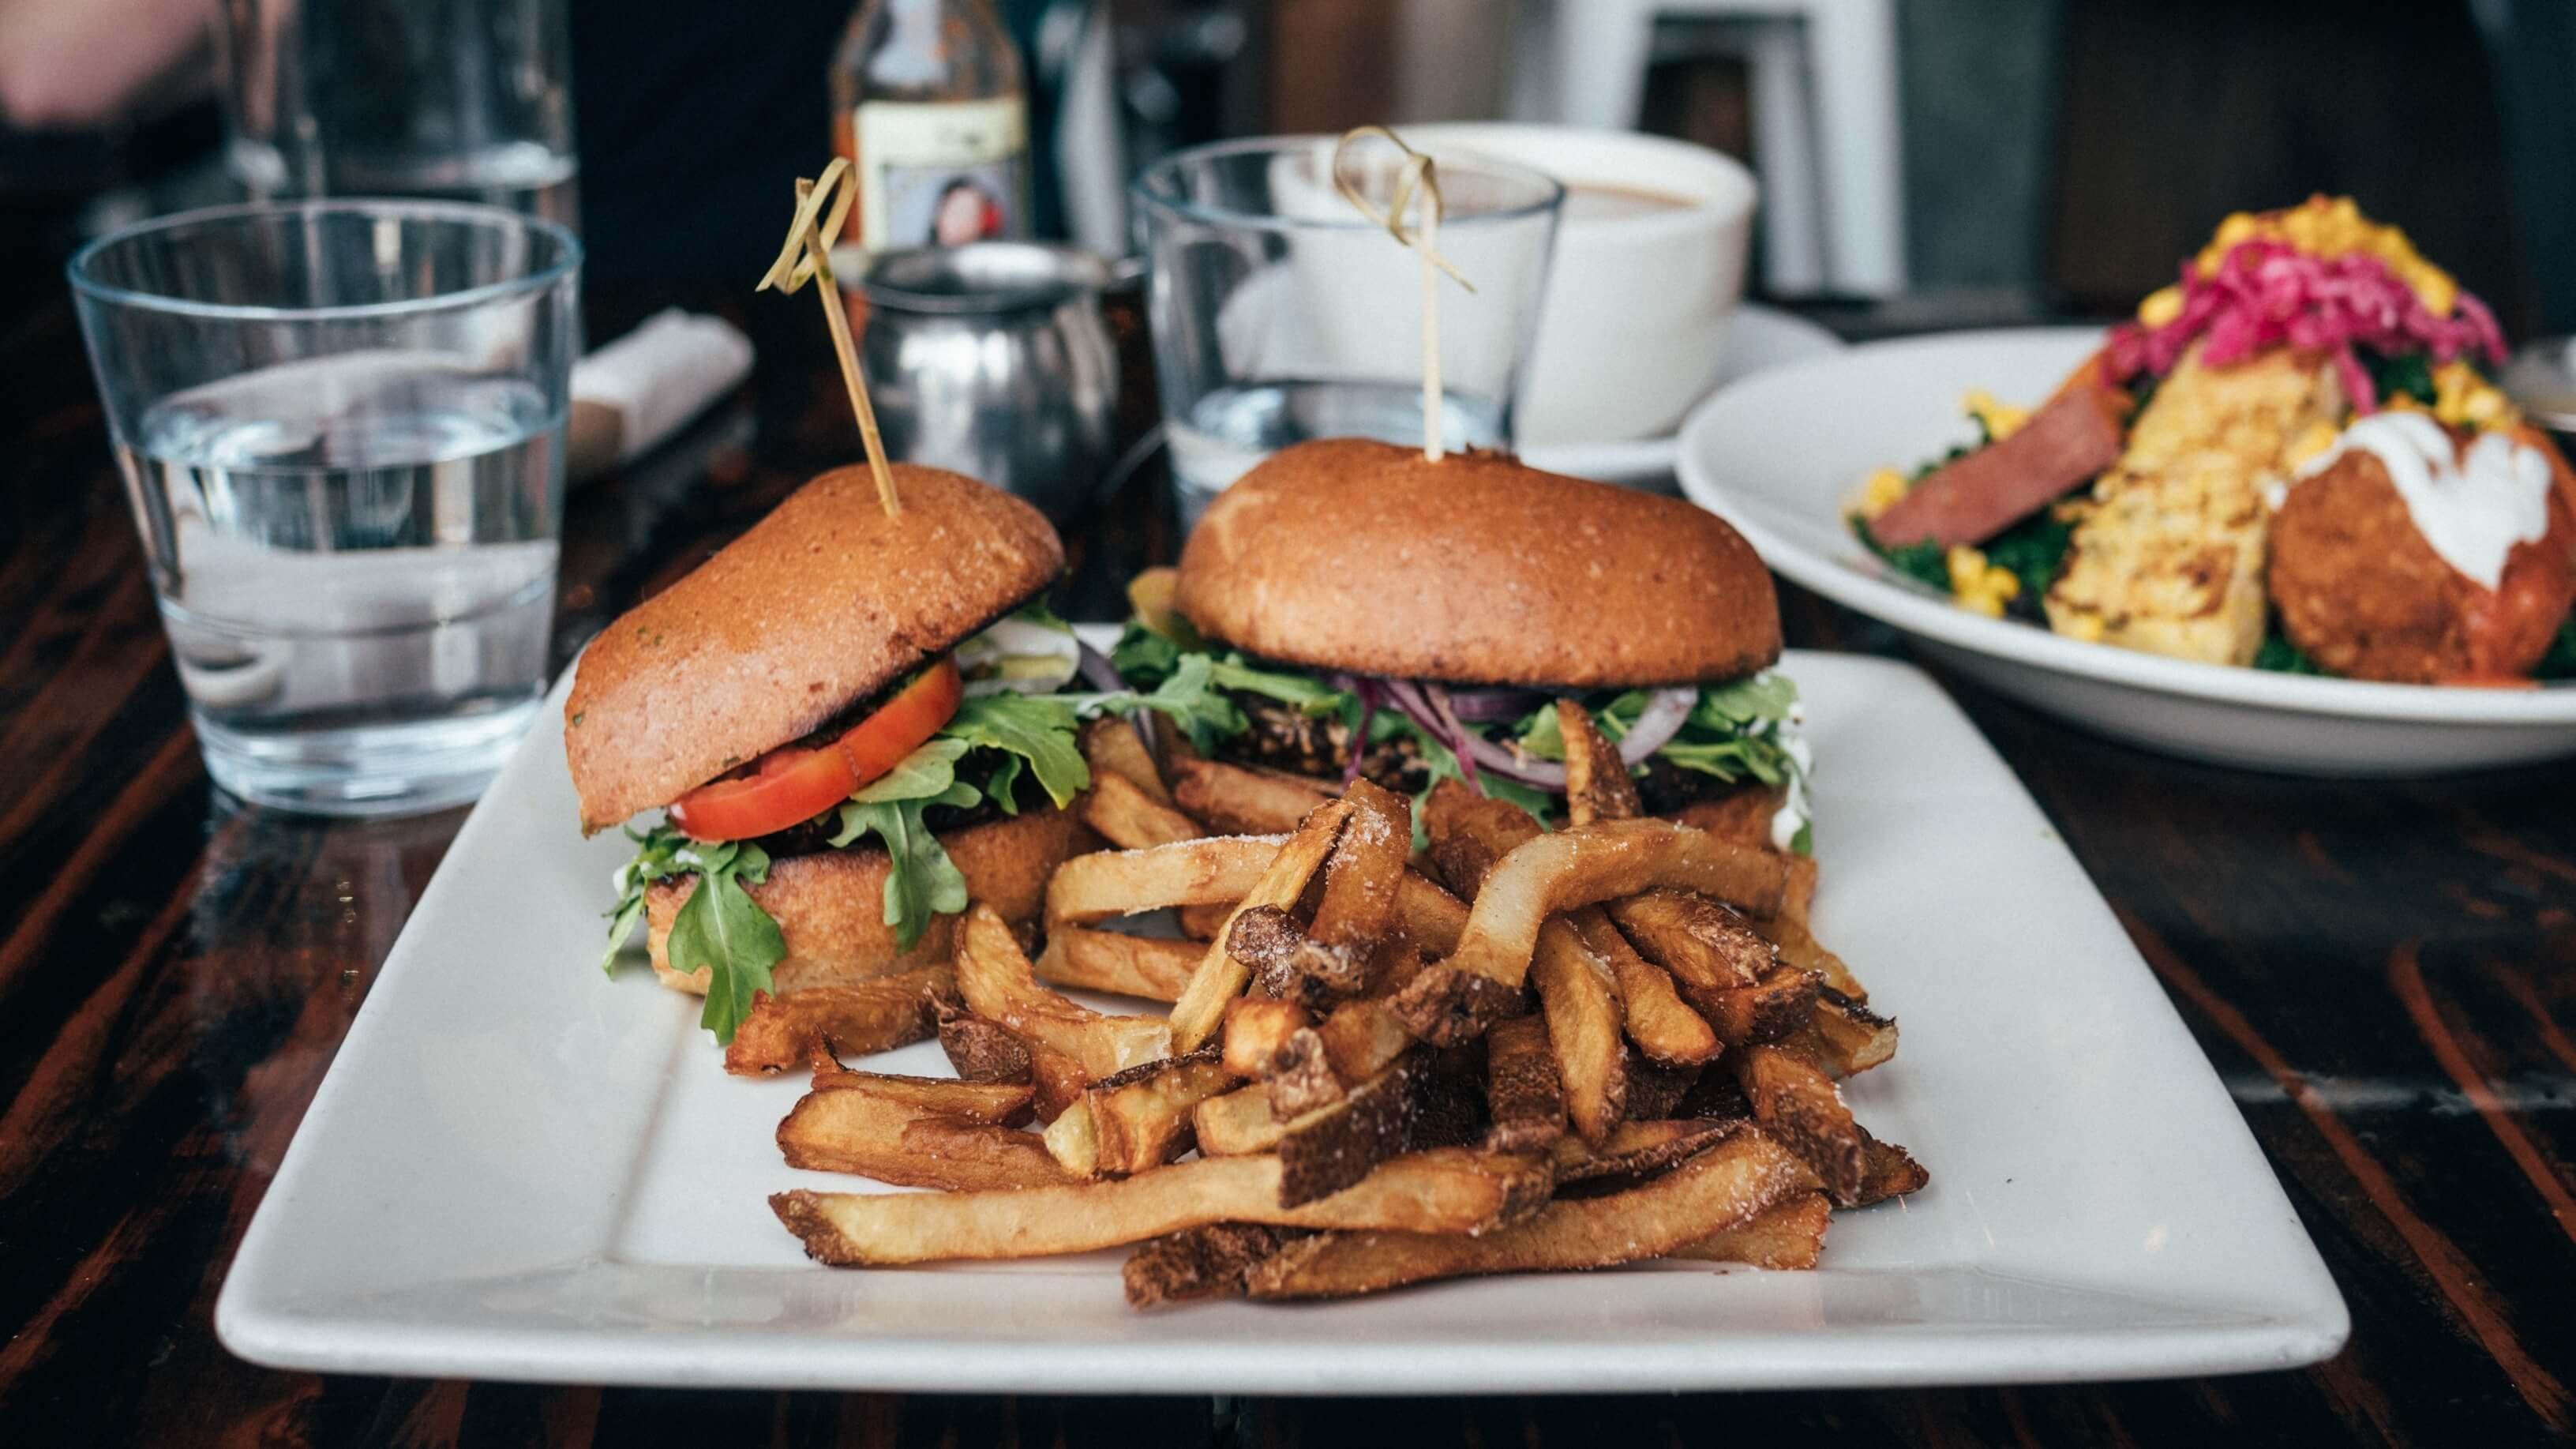 Vegan Burger Restaurant 'Buffalo' Replaces Chicken Shop in Brick Lane, London